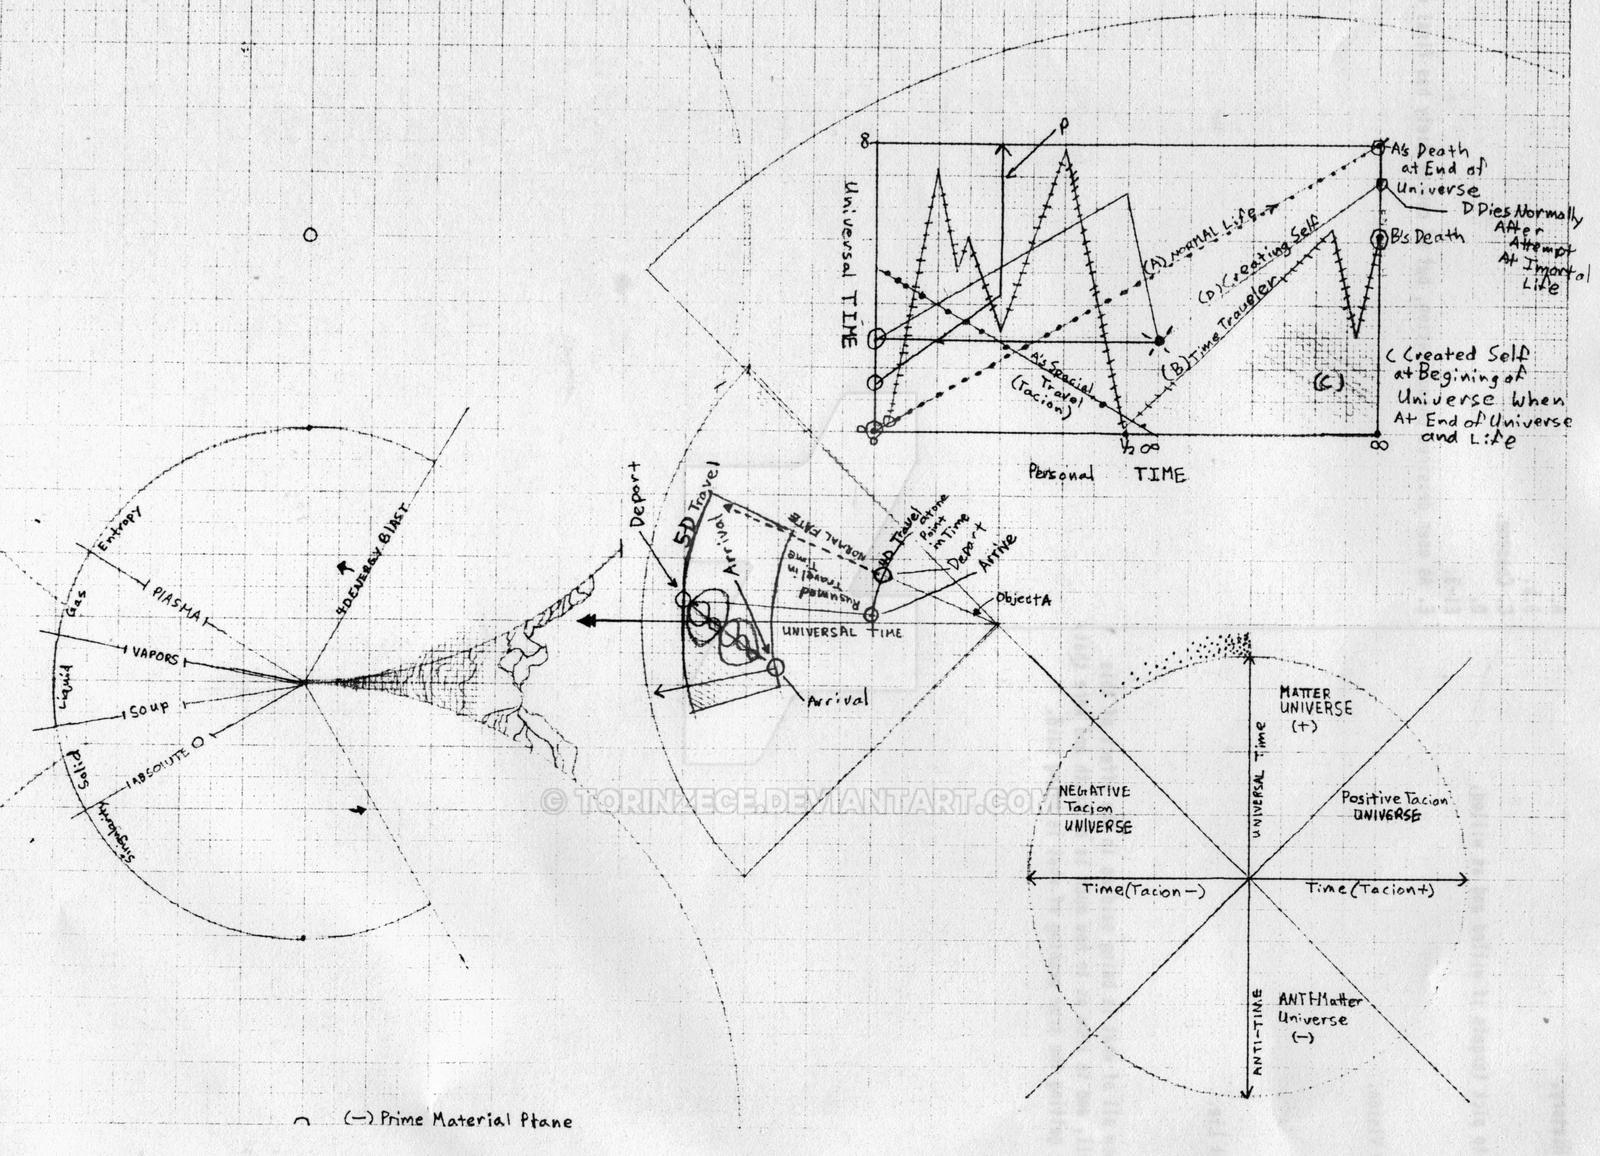 Dimensional Planes study